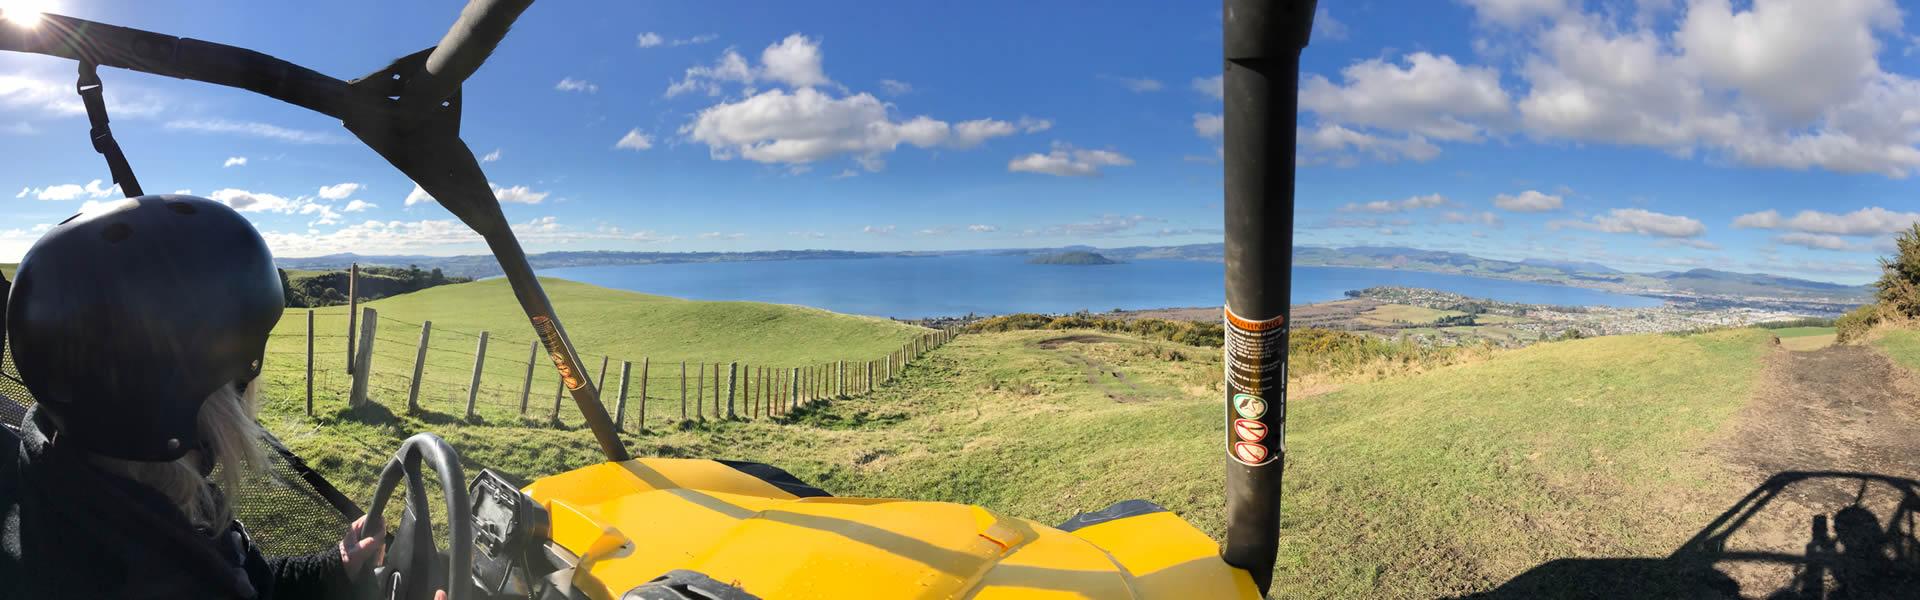 Rotorua Quad Bikes at Rotorua Adventure Playground